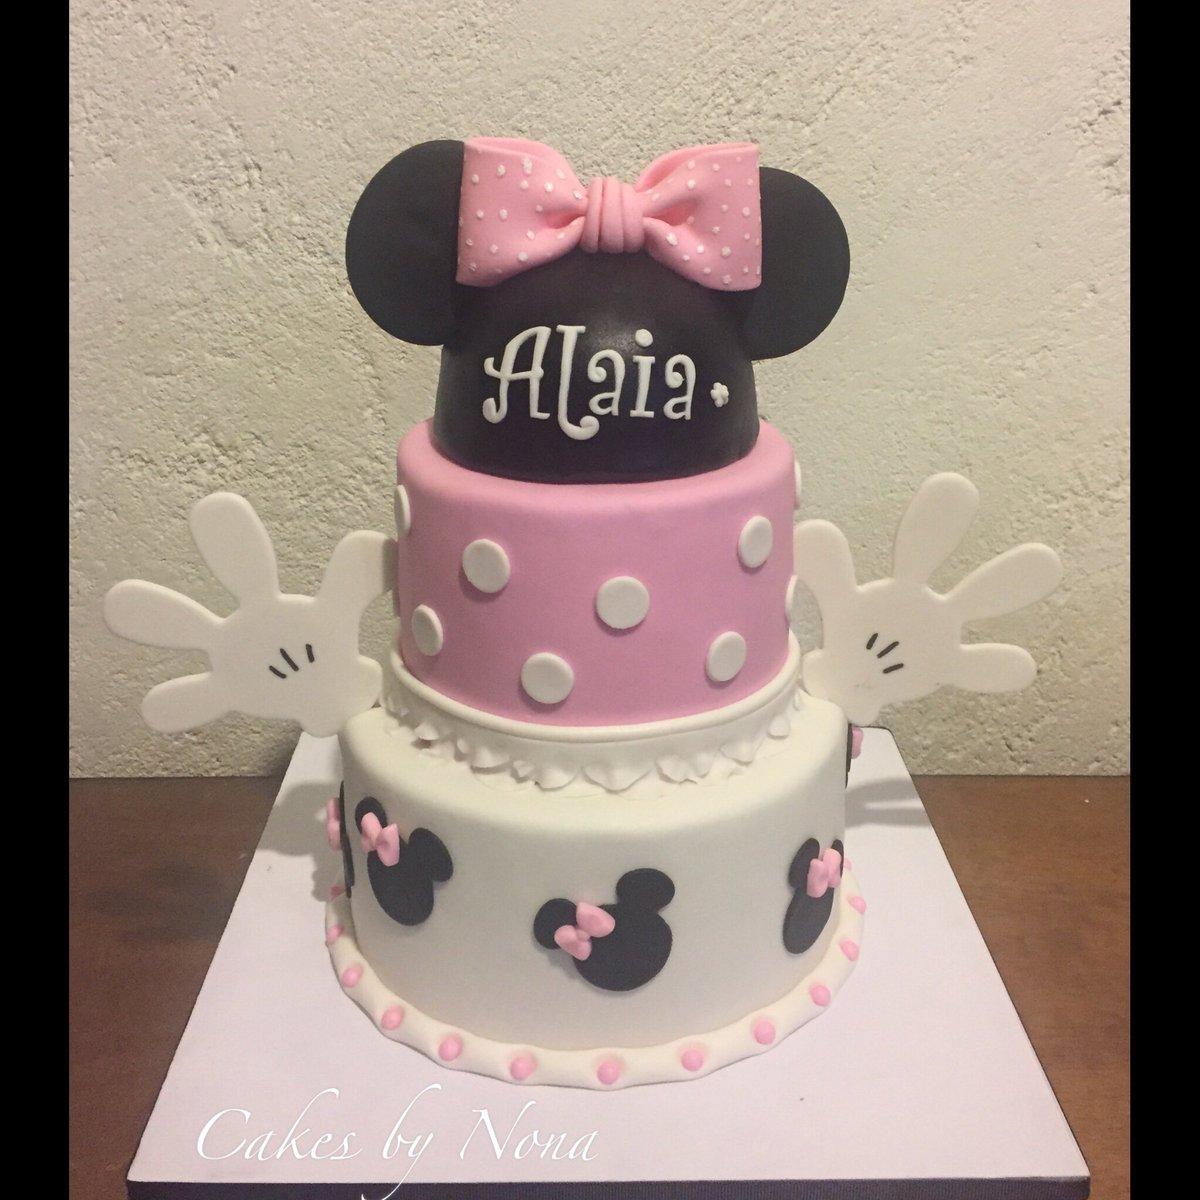 Wondrous Cakesbynona Auf Twitter Minnie Mouse First Bday Cake Primer Funny Birthday Cards Online Alyptdamsfinfo